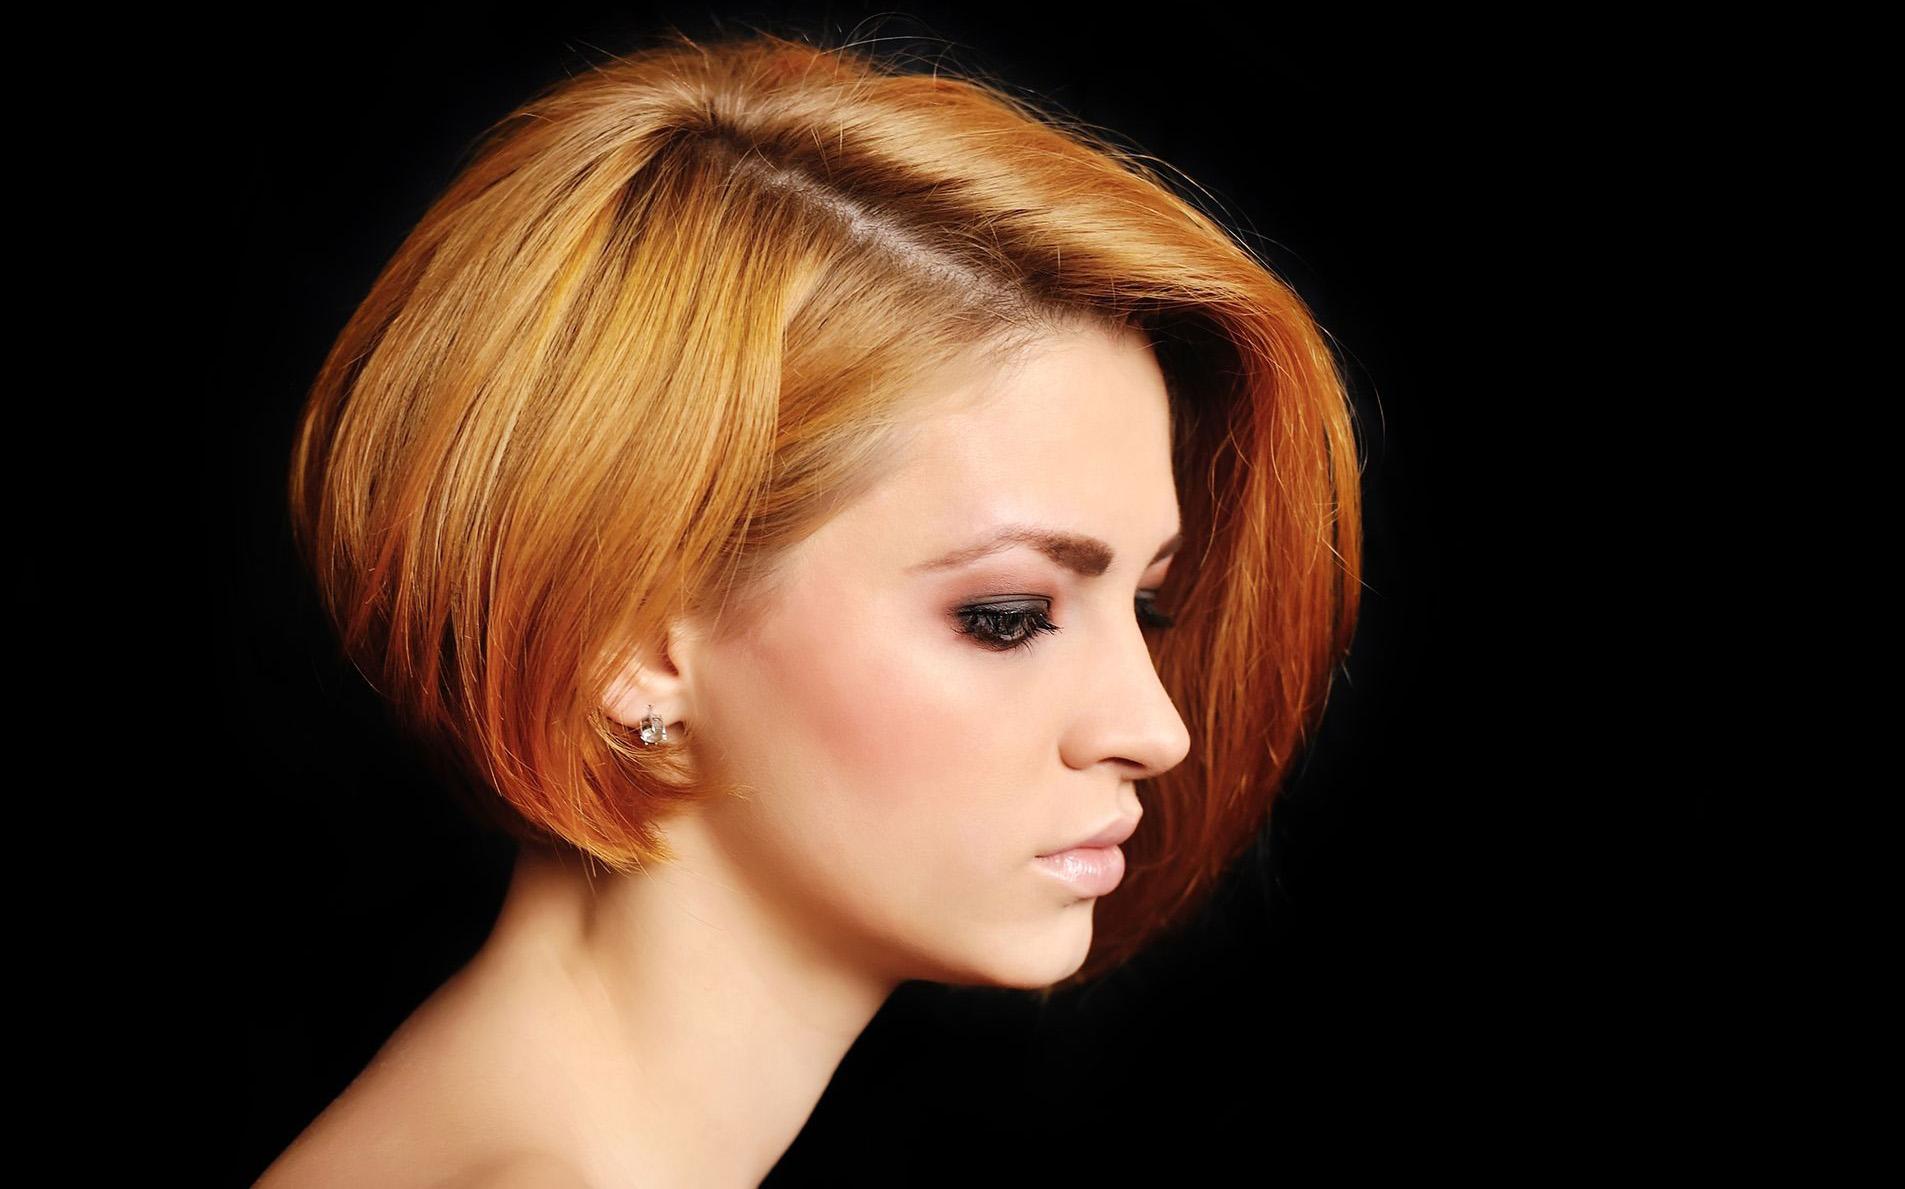 trend-taglio-easy-zephir-parrucchieri-ascona-muralto